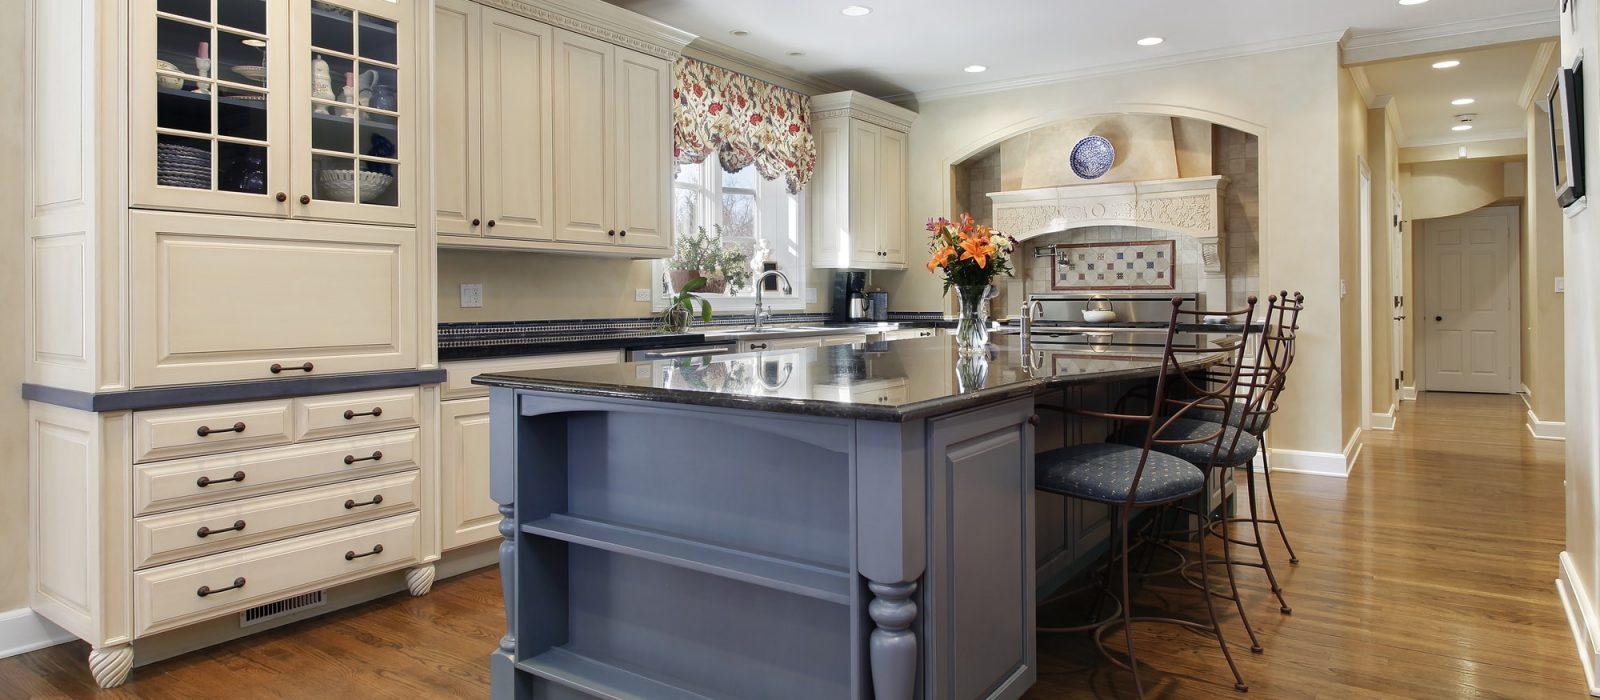 In Style Flooring And Design Las Vegas Flooring Kitchen